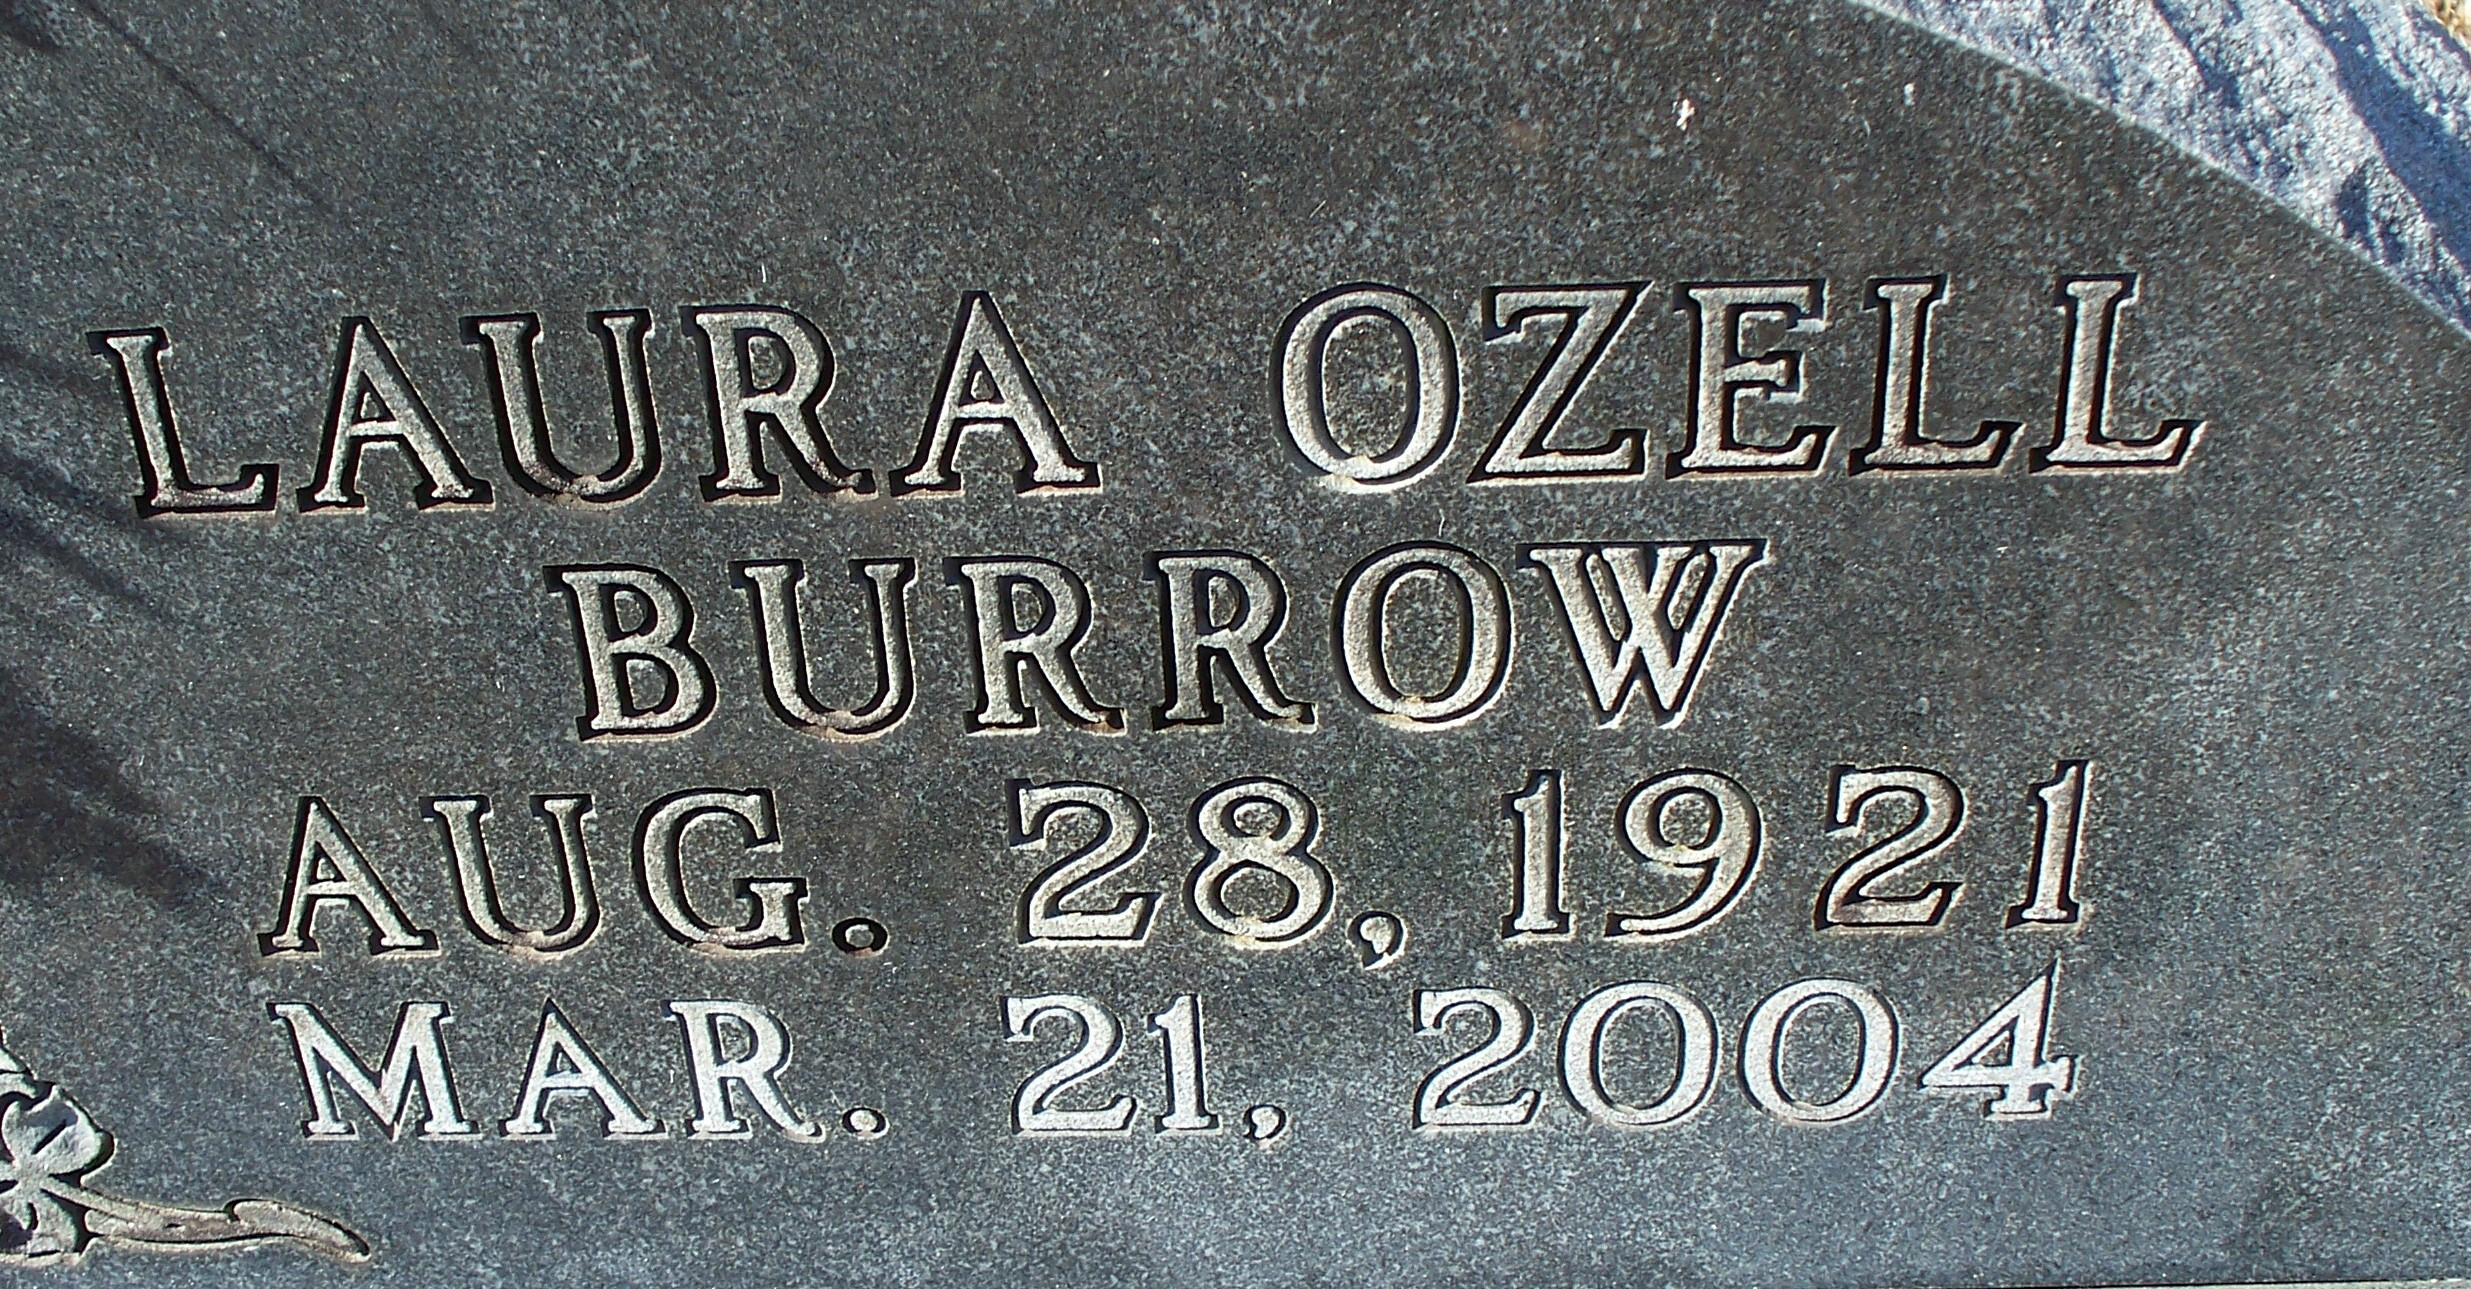 Laura Ozell <i>Burrow</i> Collins